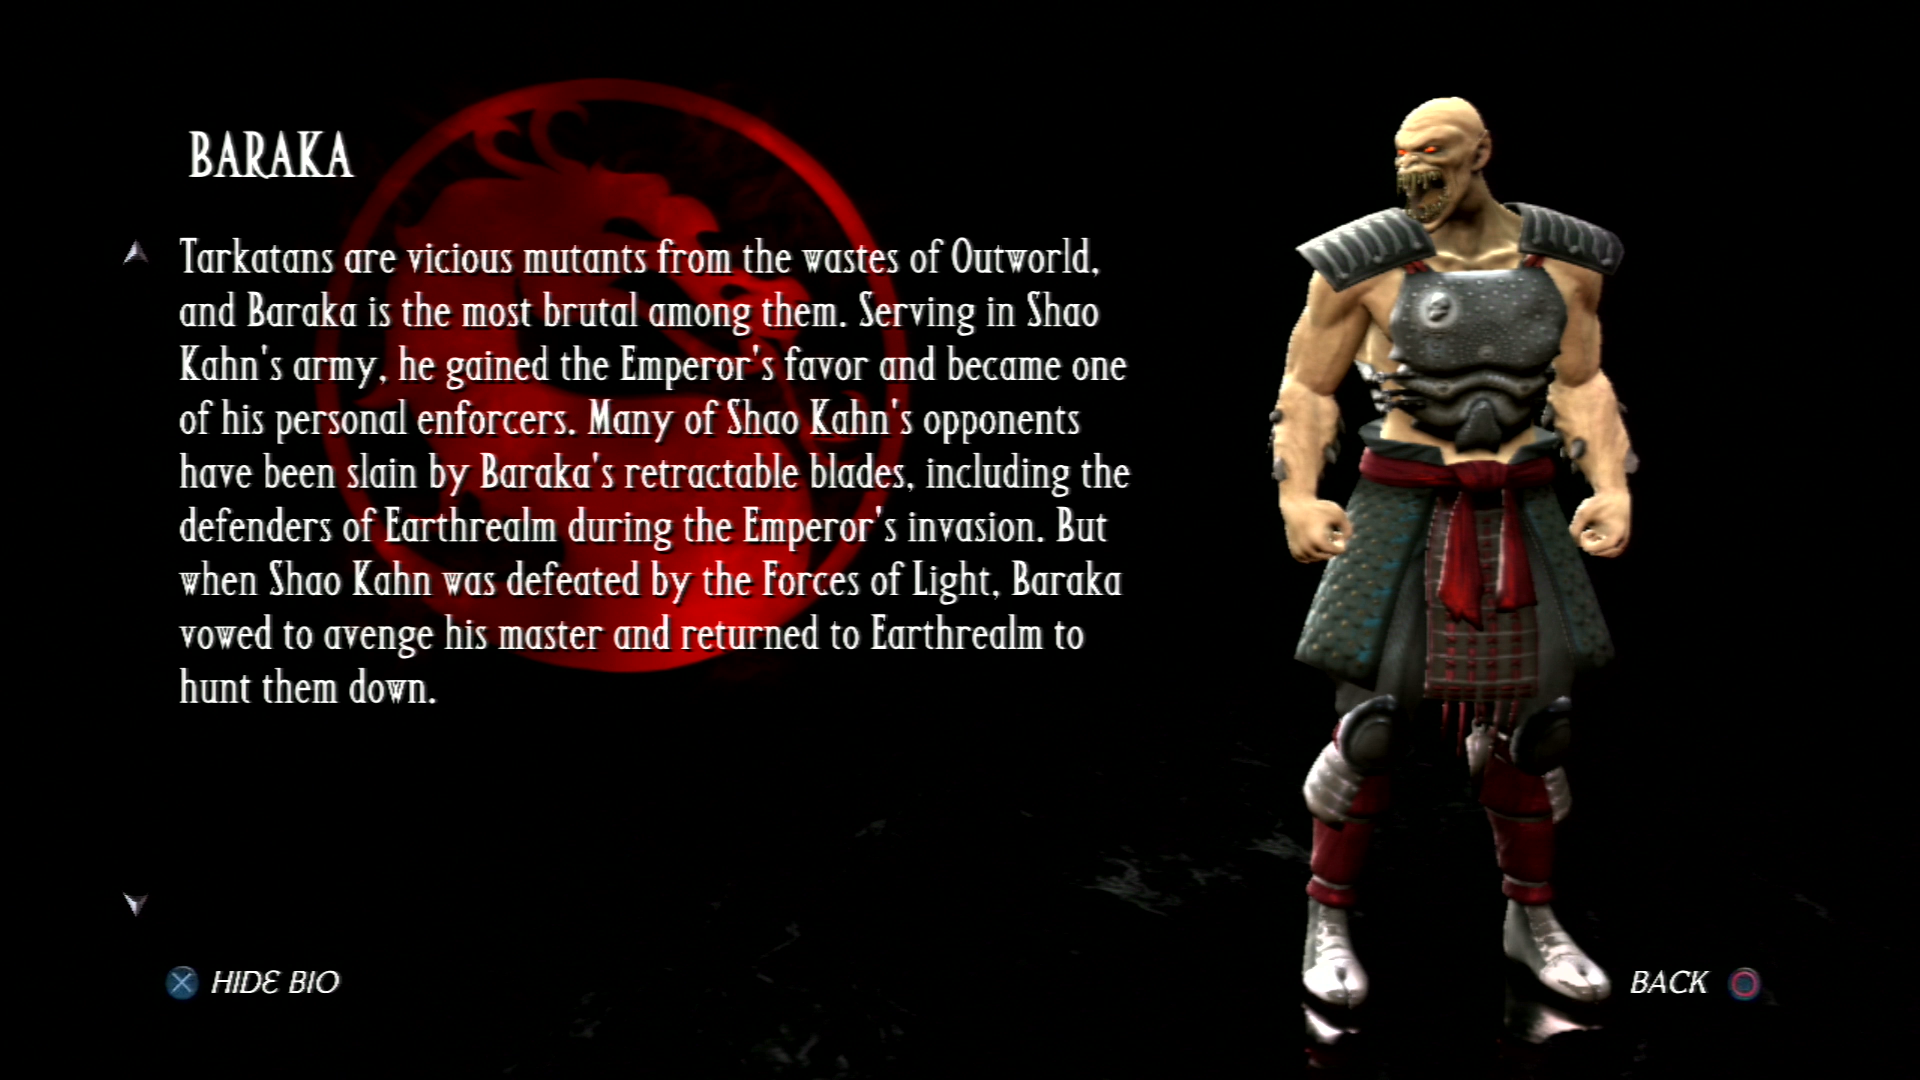 Барака - Mortal Kombat vs. DC Universe Персонаж